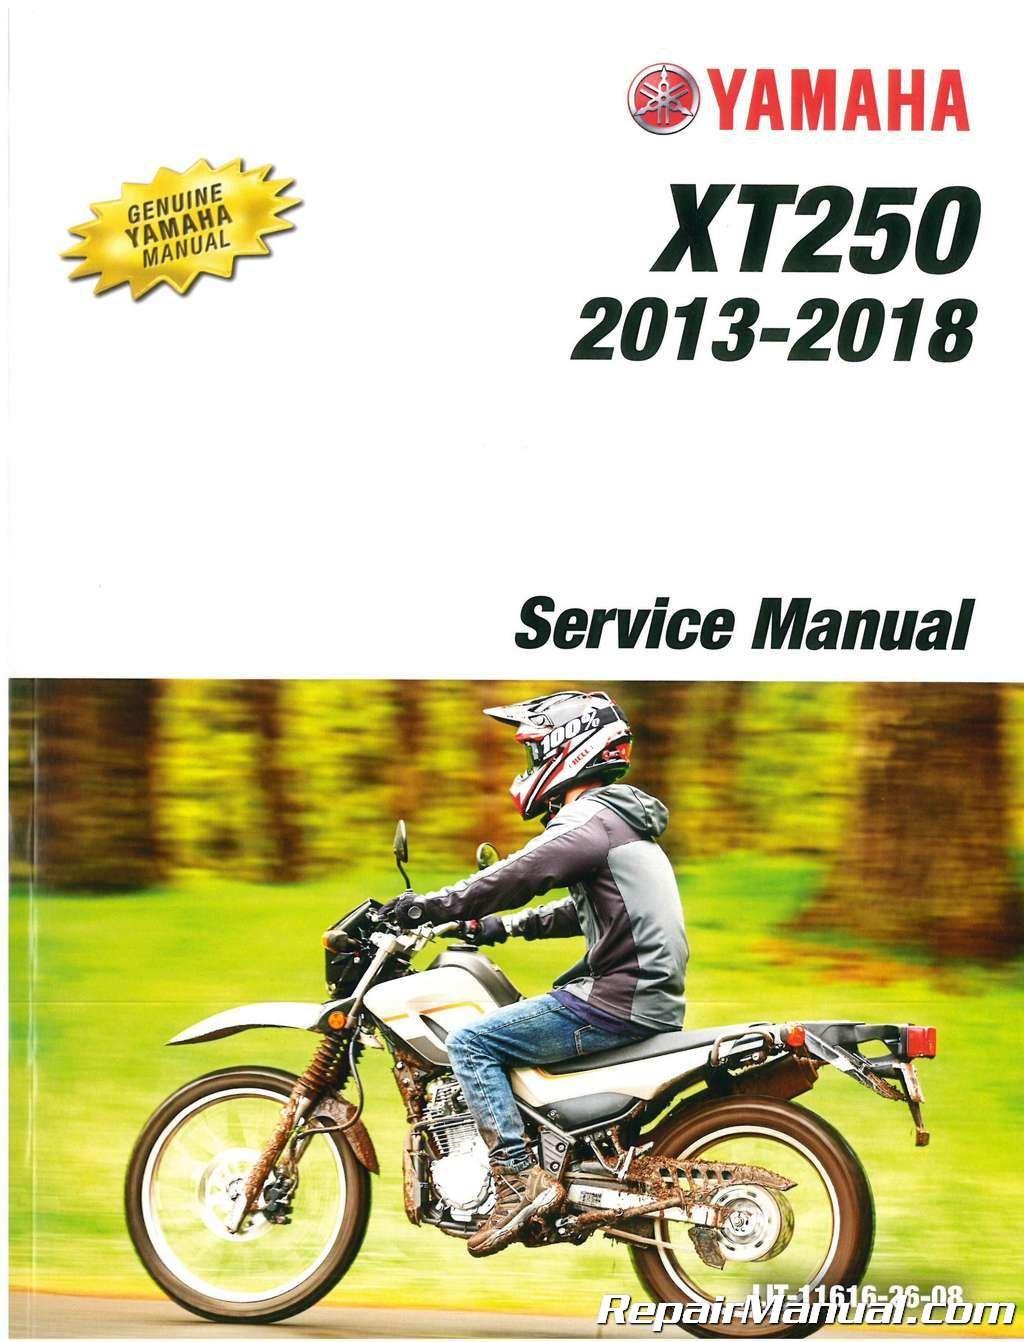 2018 Yamaha XT250 Motorcycle Service Manual: Manufacturer: Amazon.com: Books